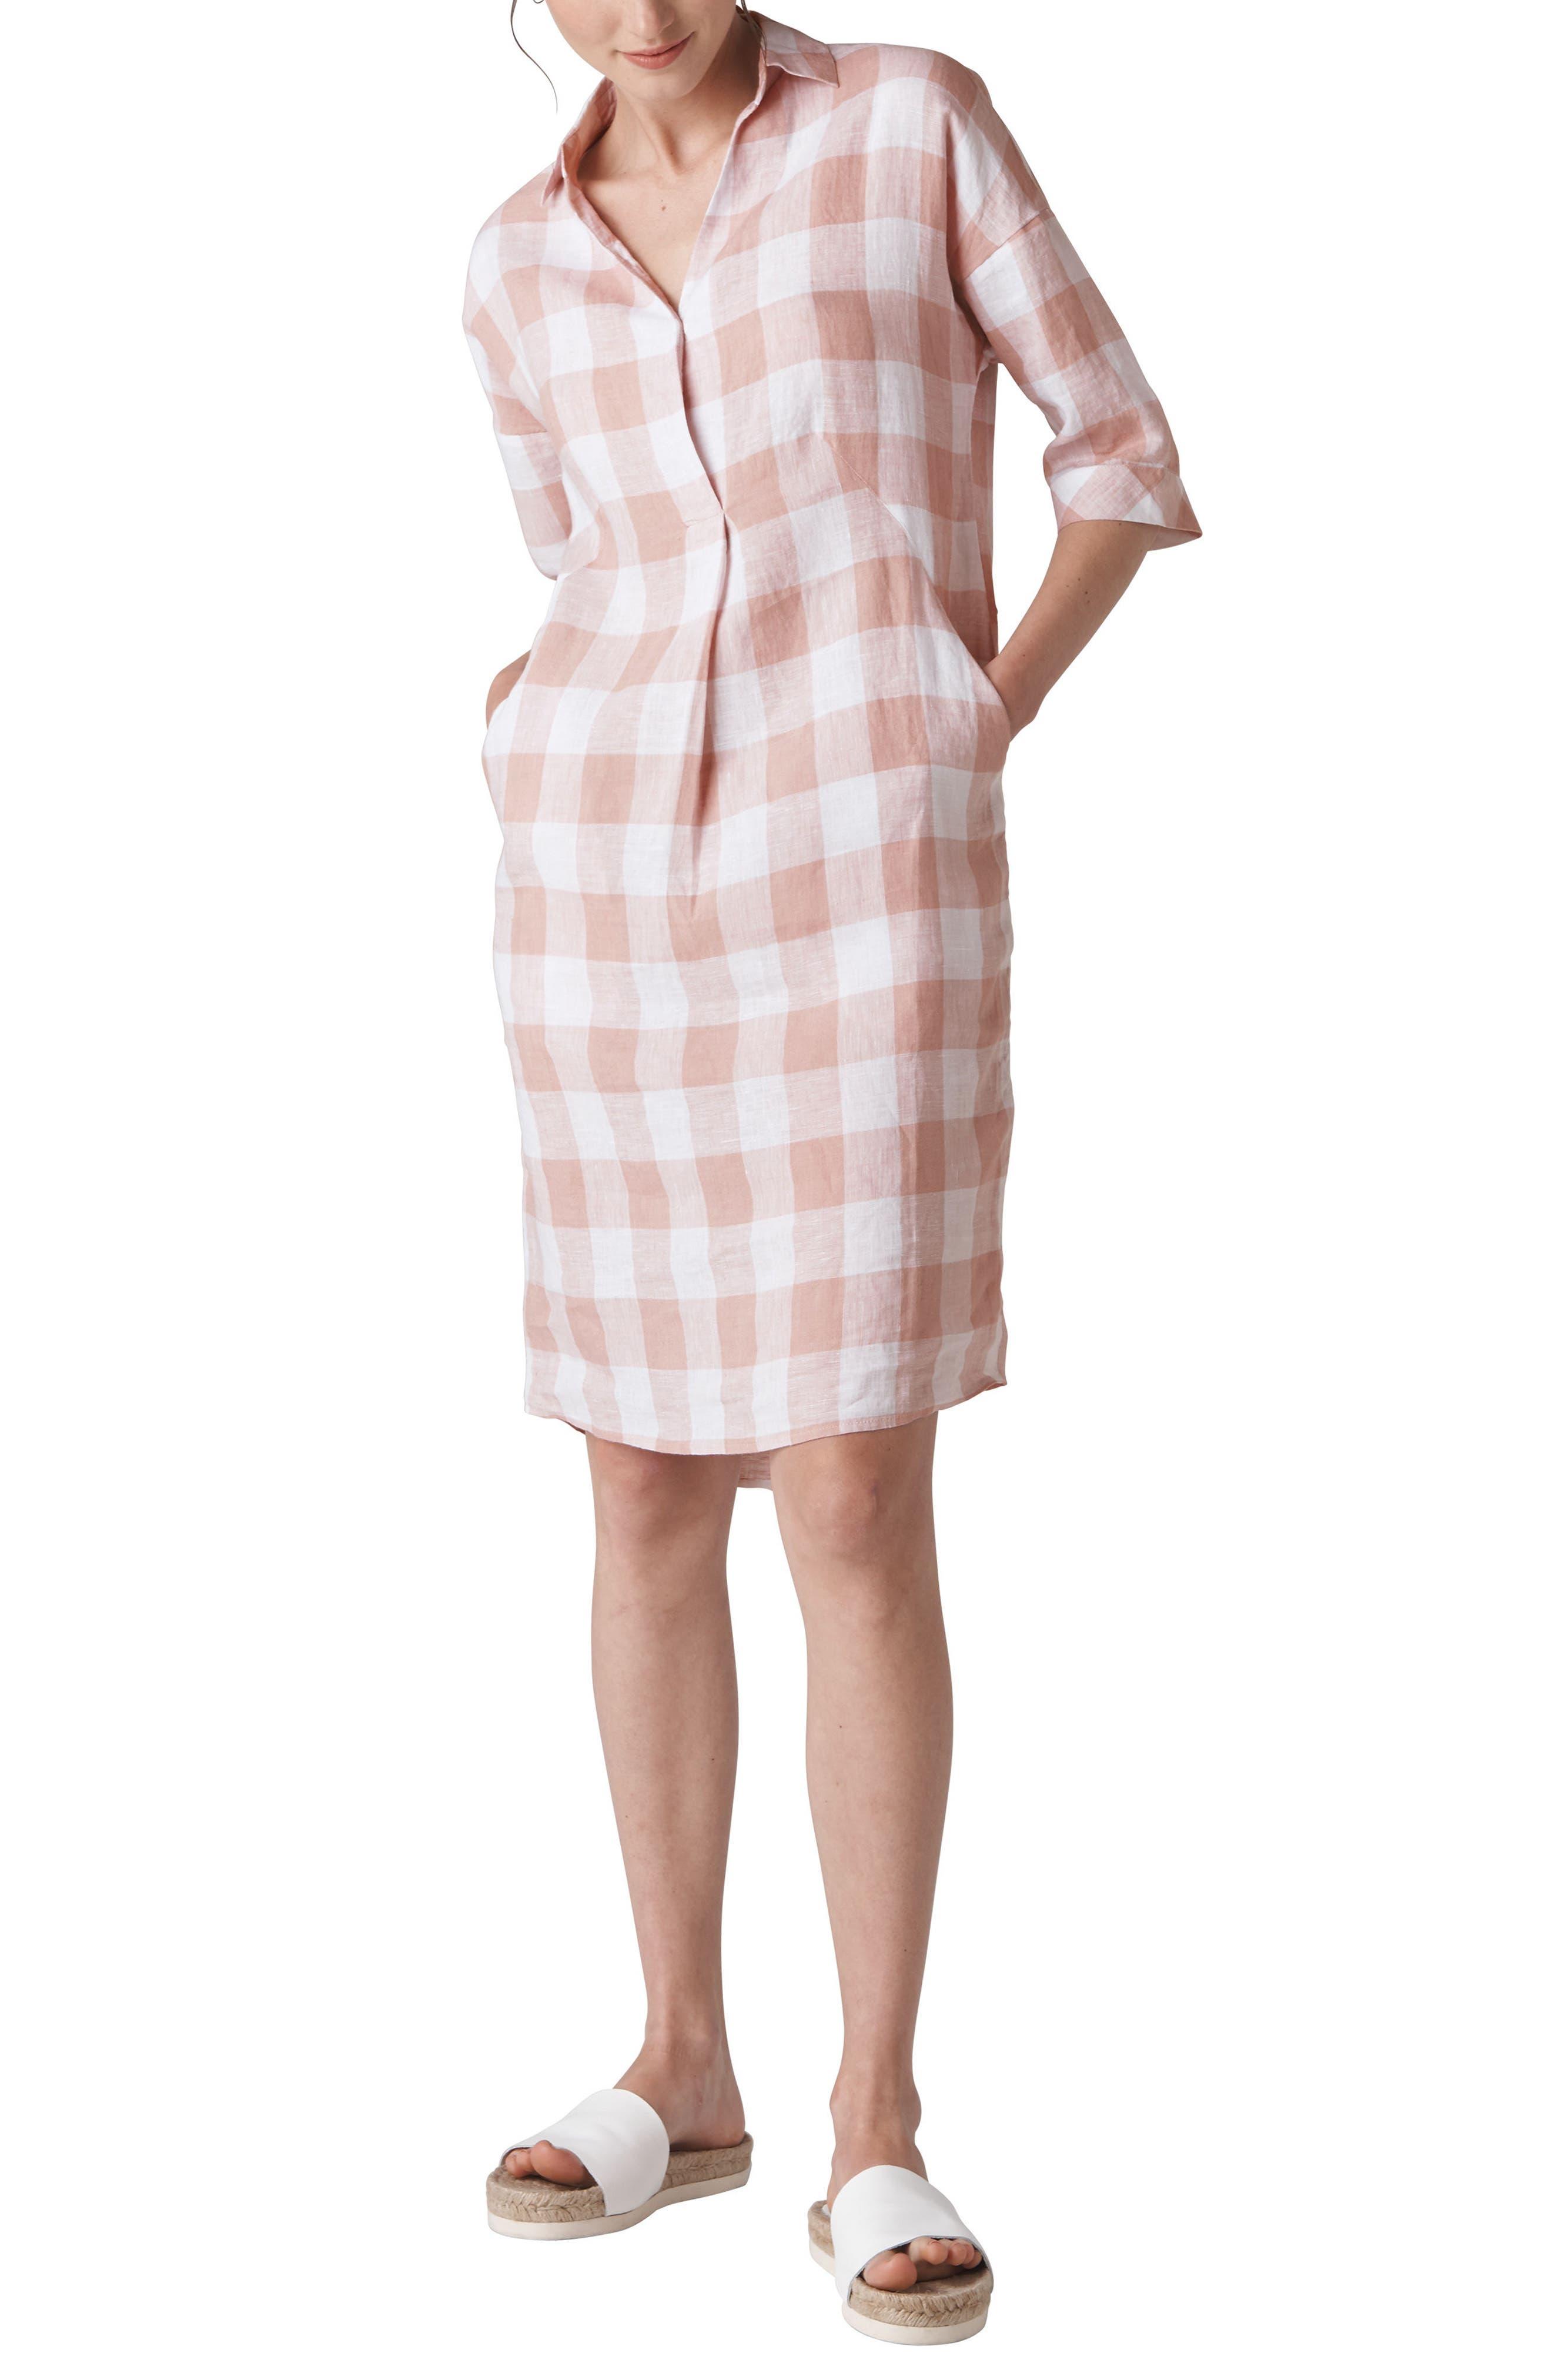 Lola Gingham Dress,                             Main thumbnail 1, color,                             MULTI COLOR